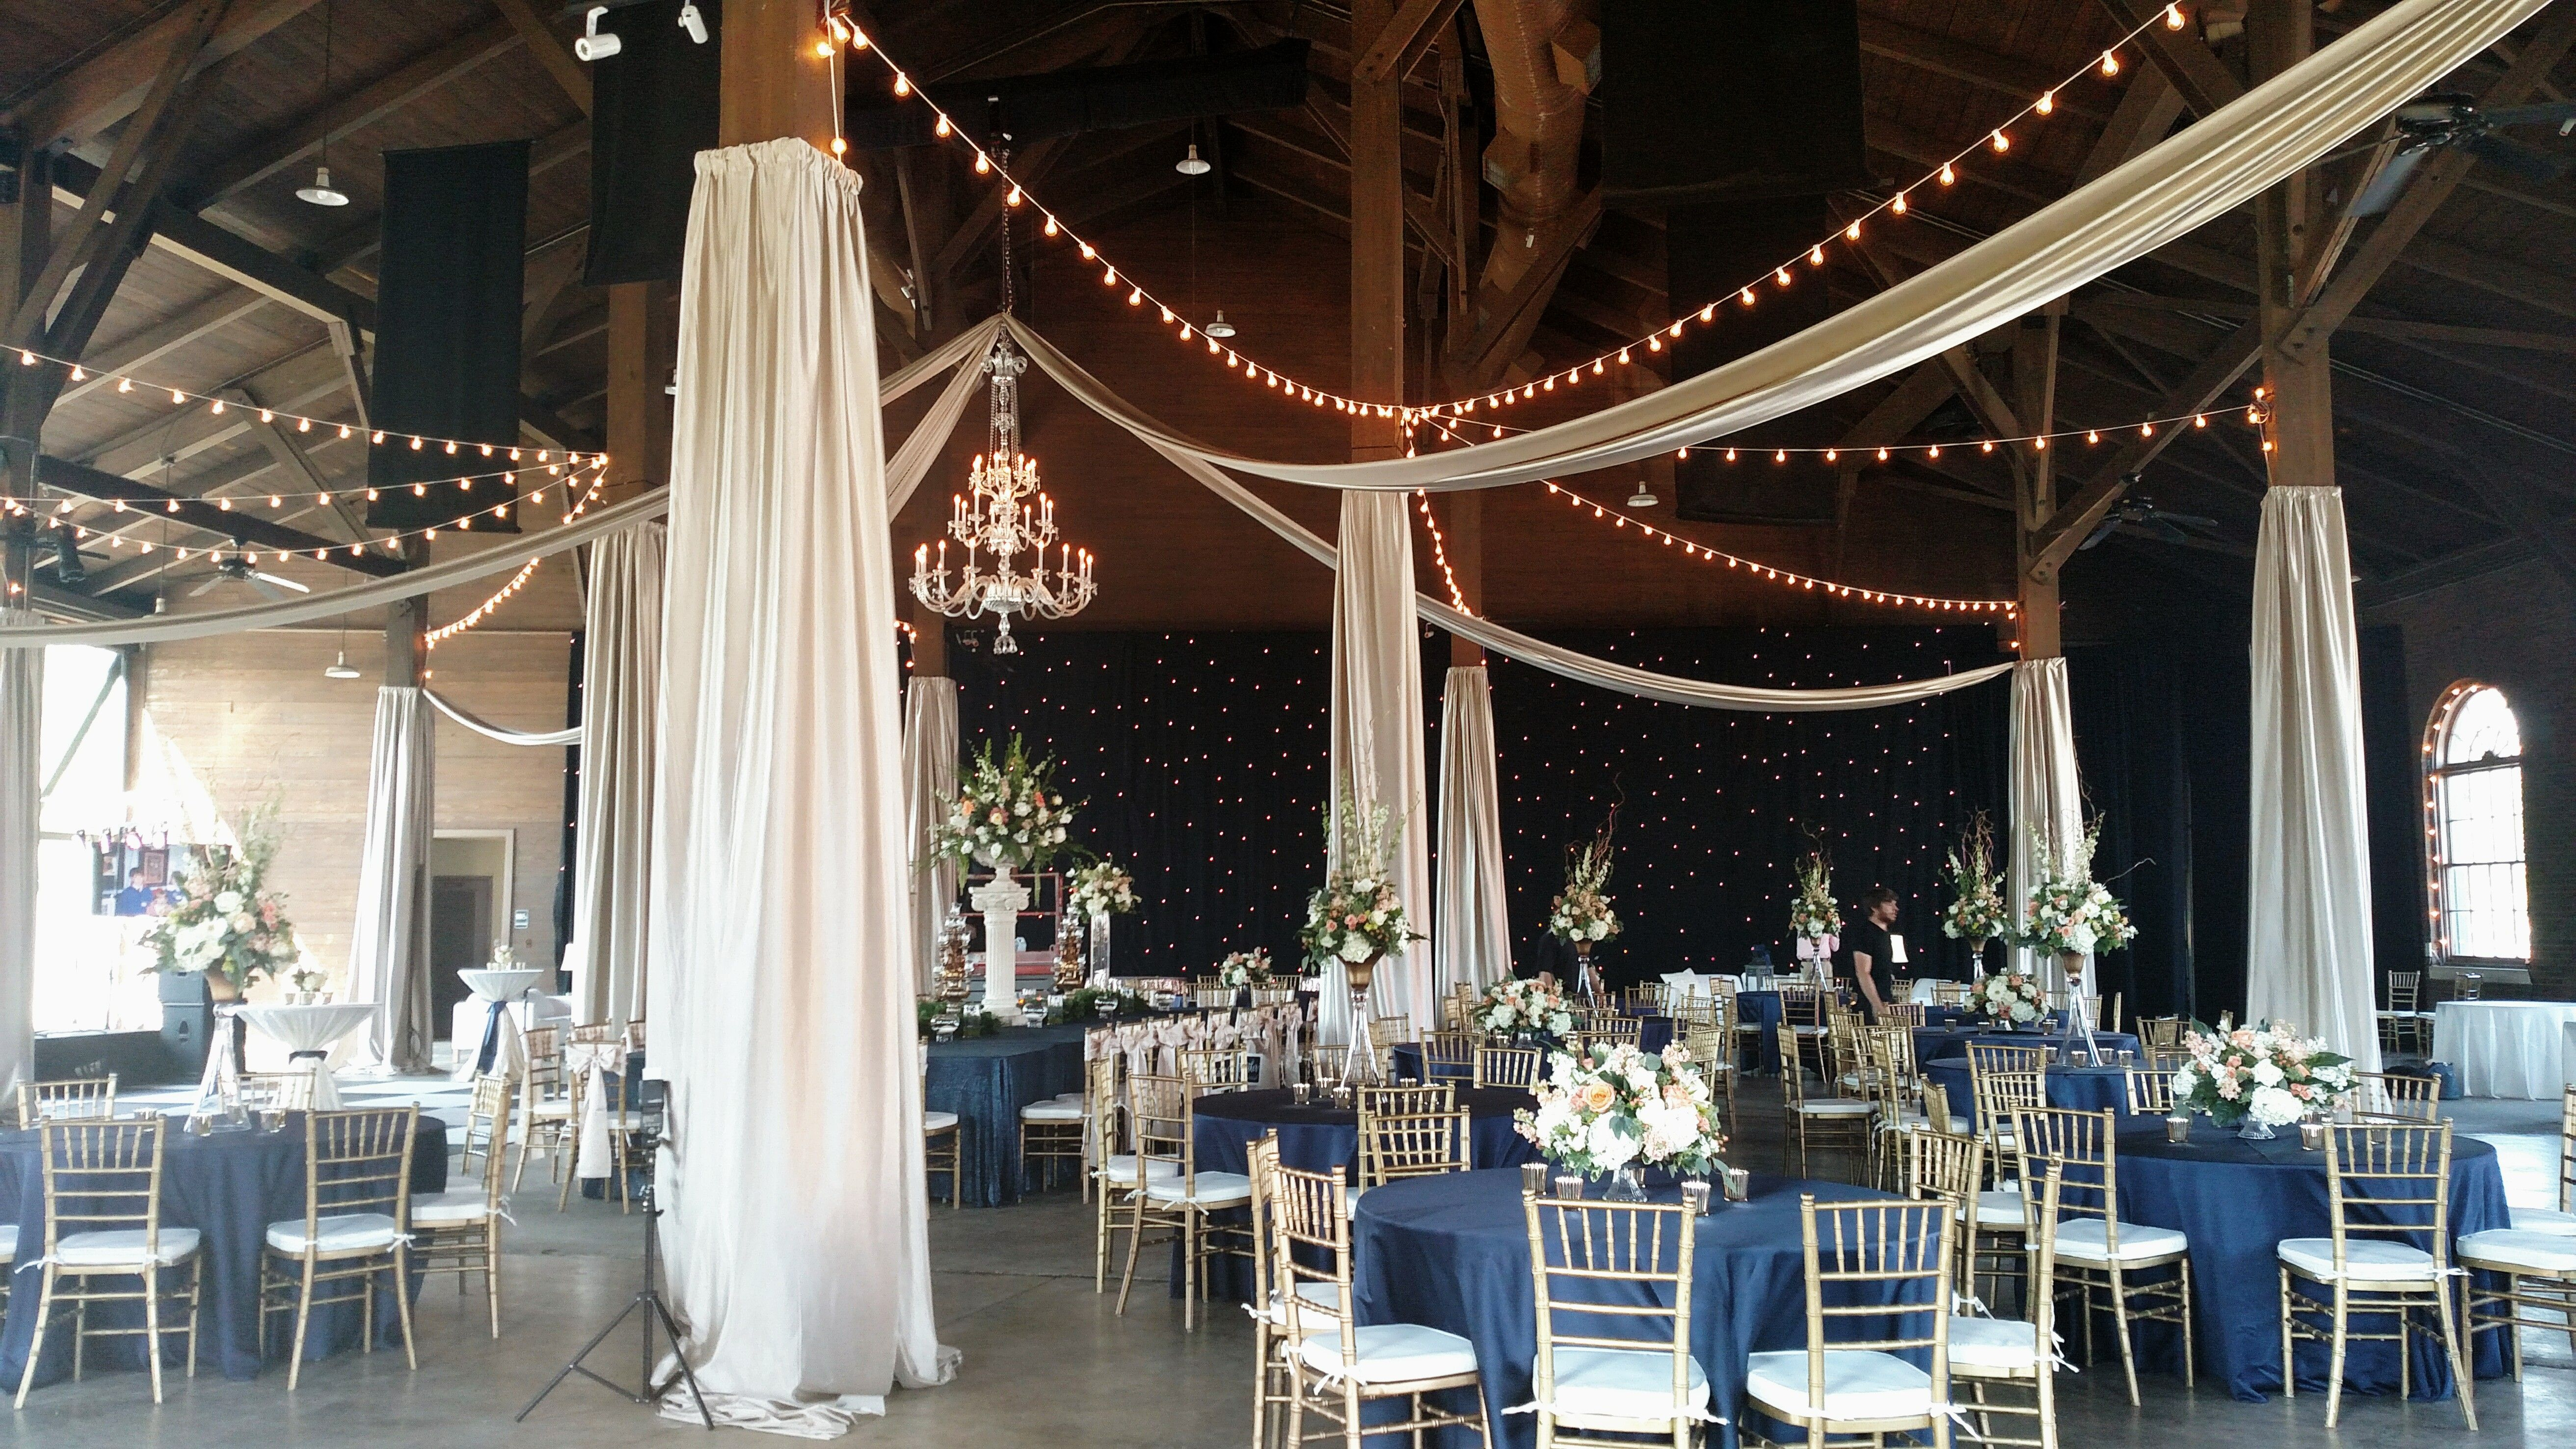 Huntsville Historic Depot RoundHouse wedding venue ...